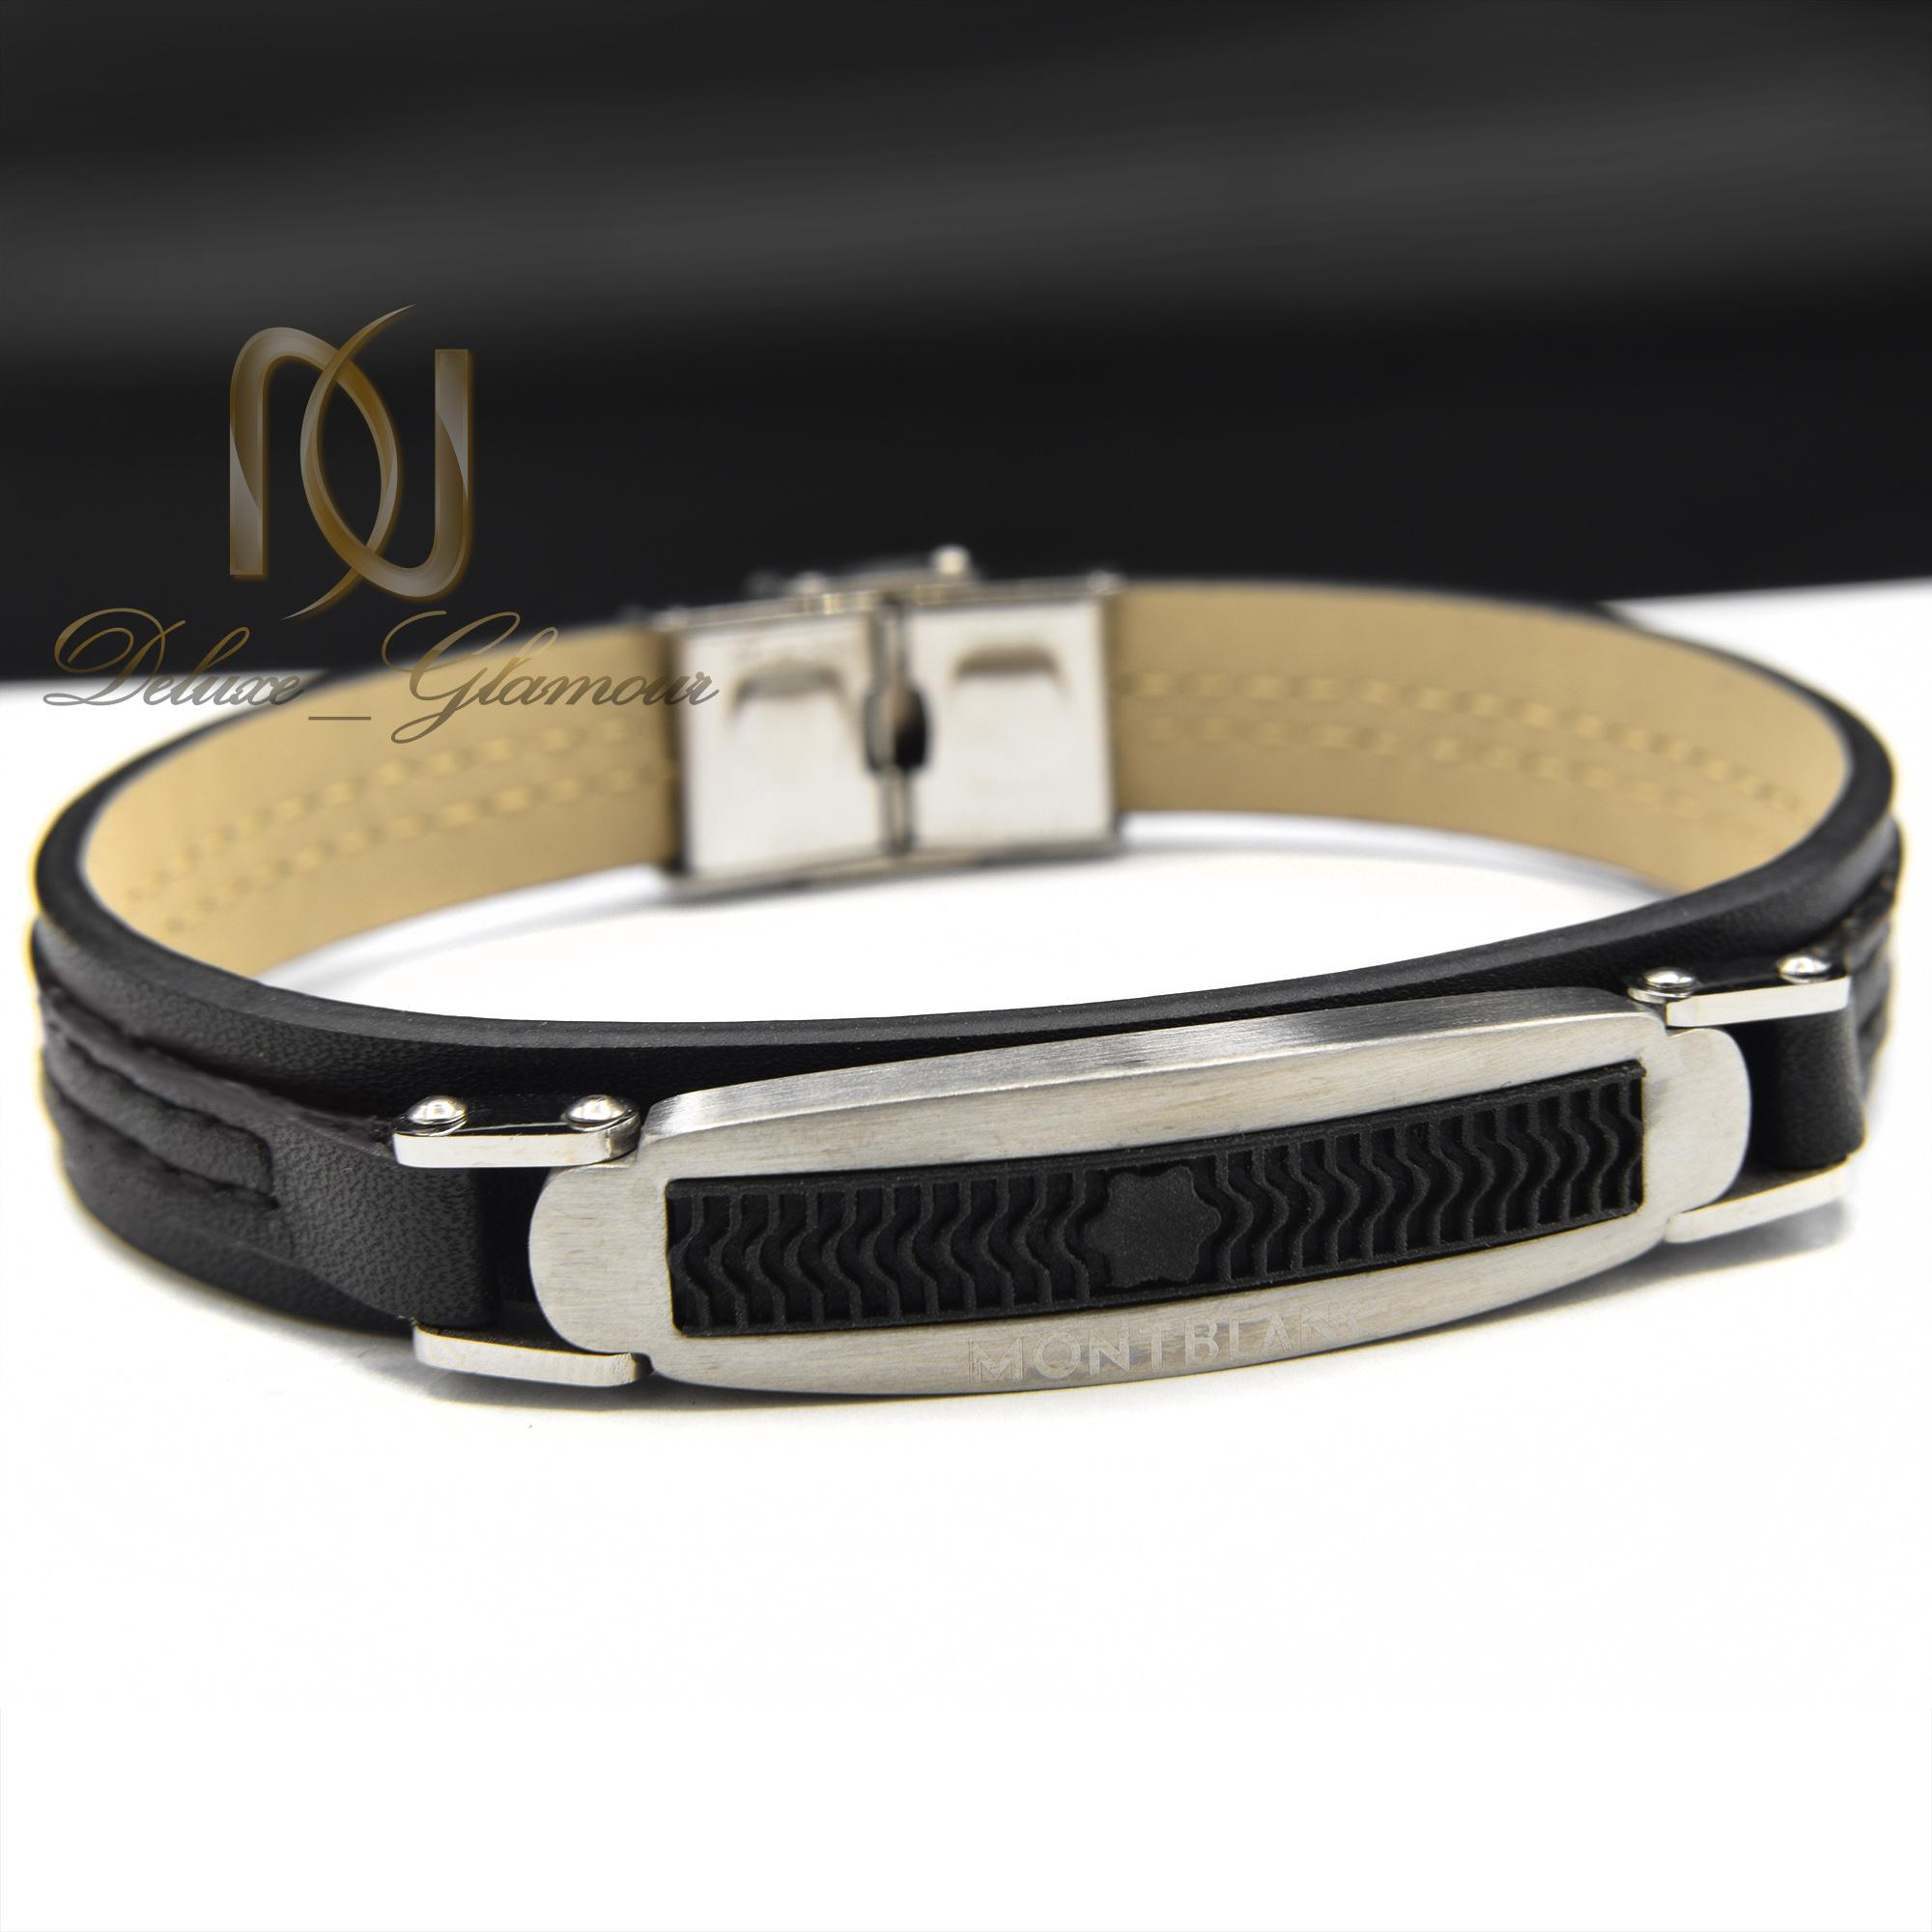 دستبند چرم پسرانه طرح مونت بلانک ds-n388 از نمای روبرو